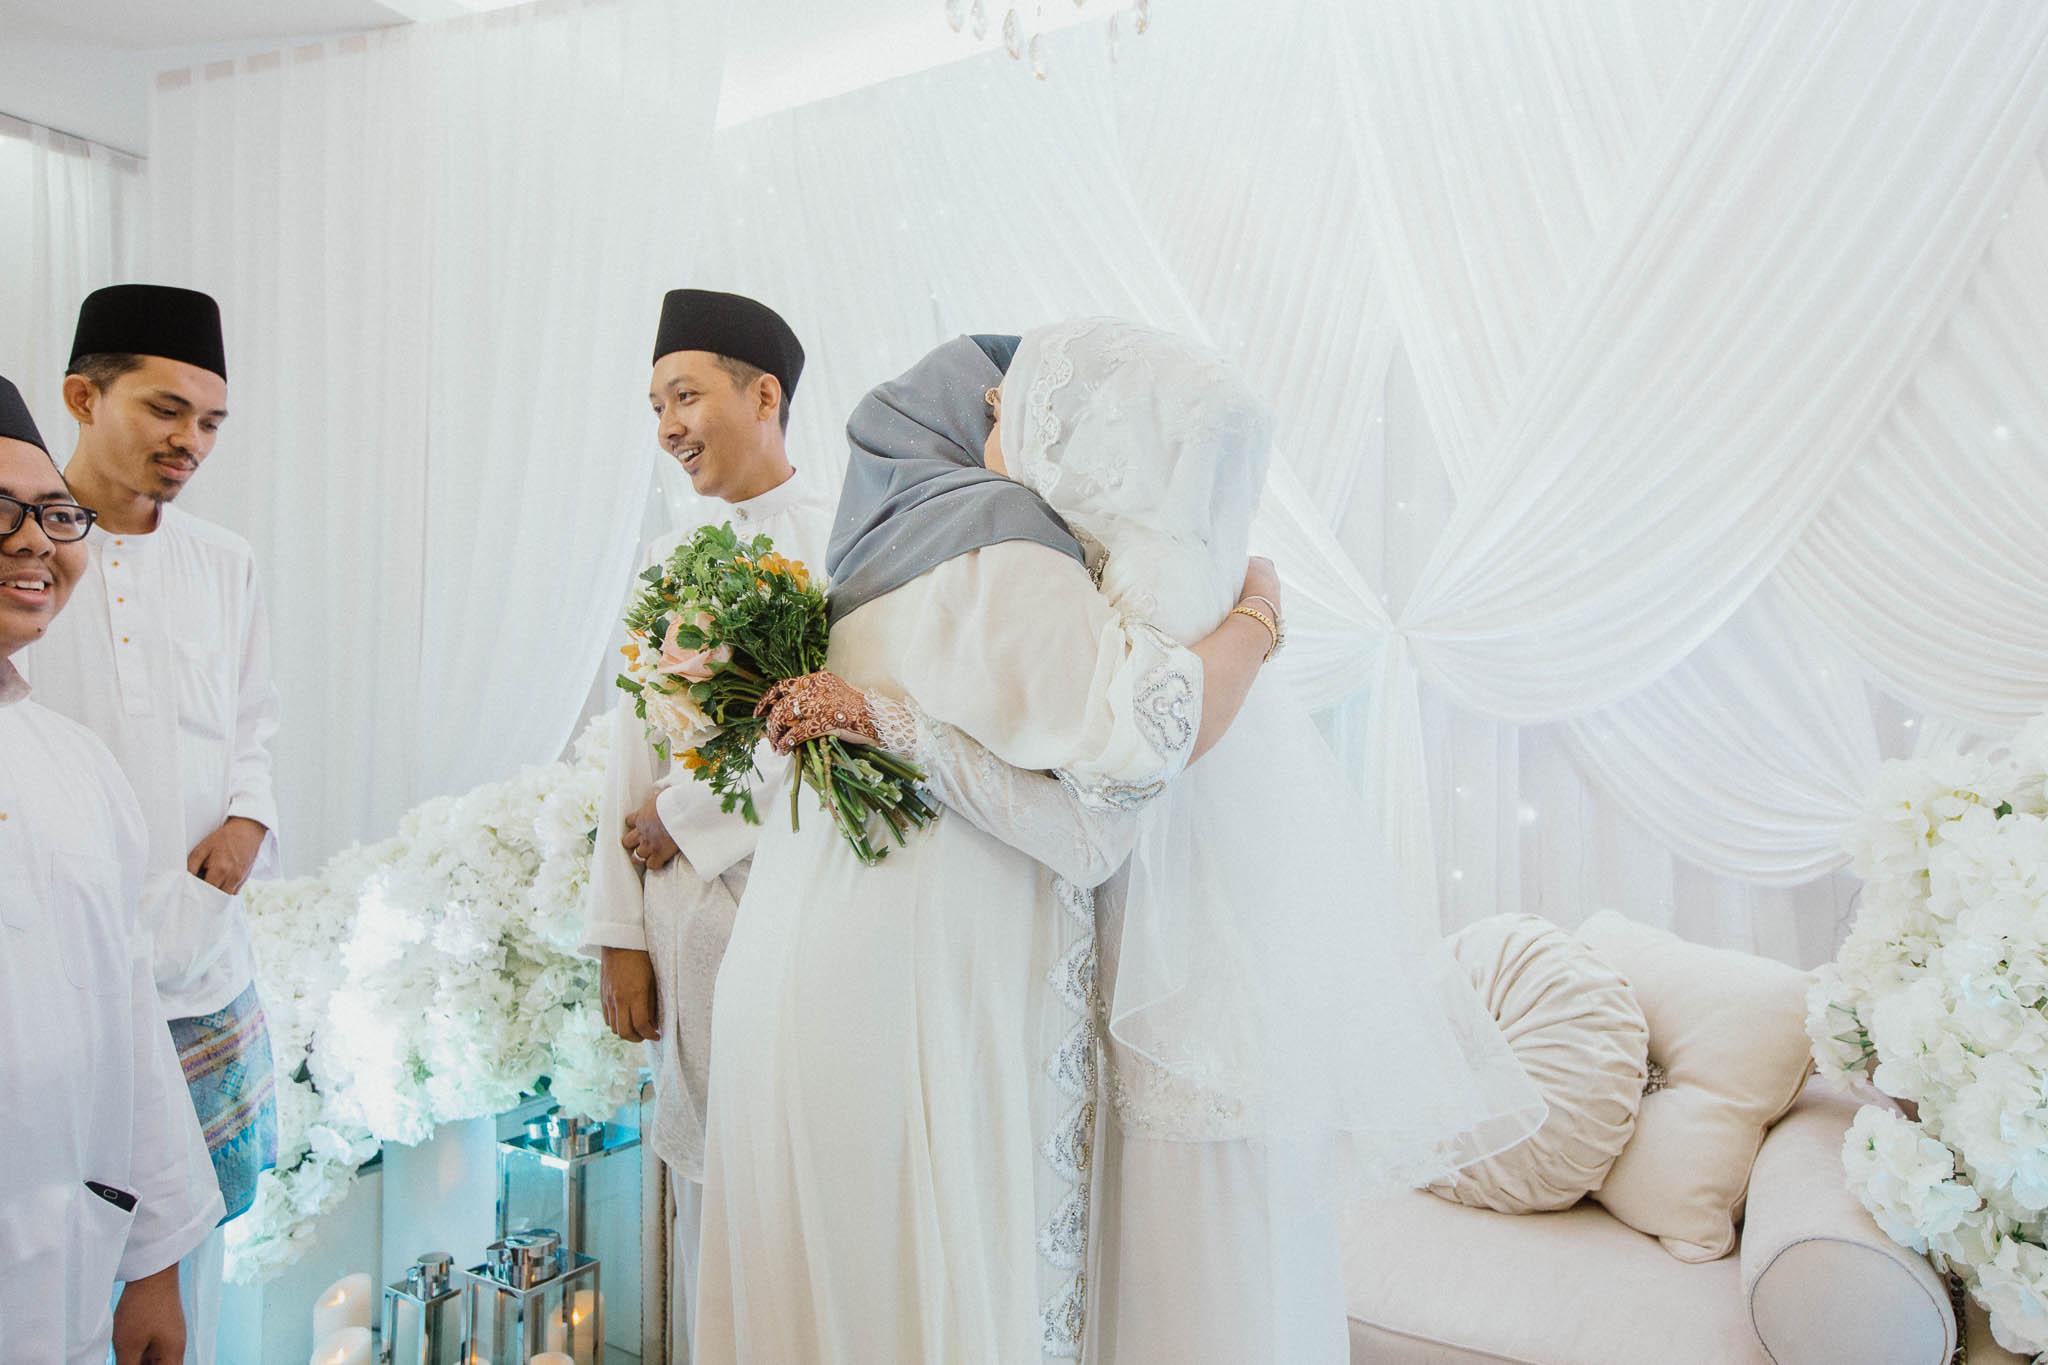 singapore-wedding-photographer-wedding-nufail-addafiq-028.jpg